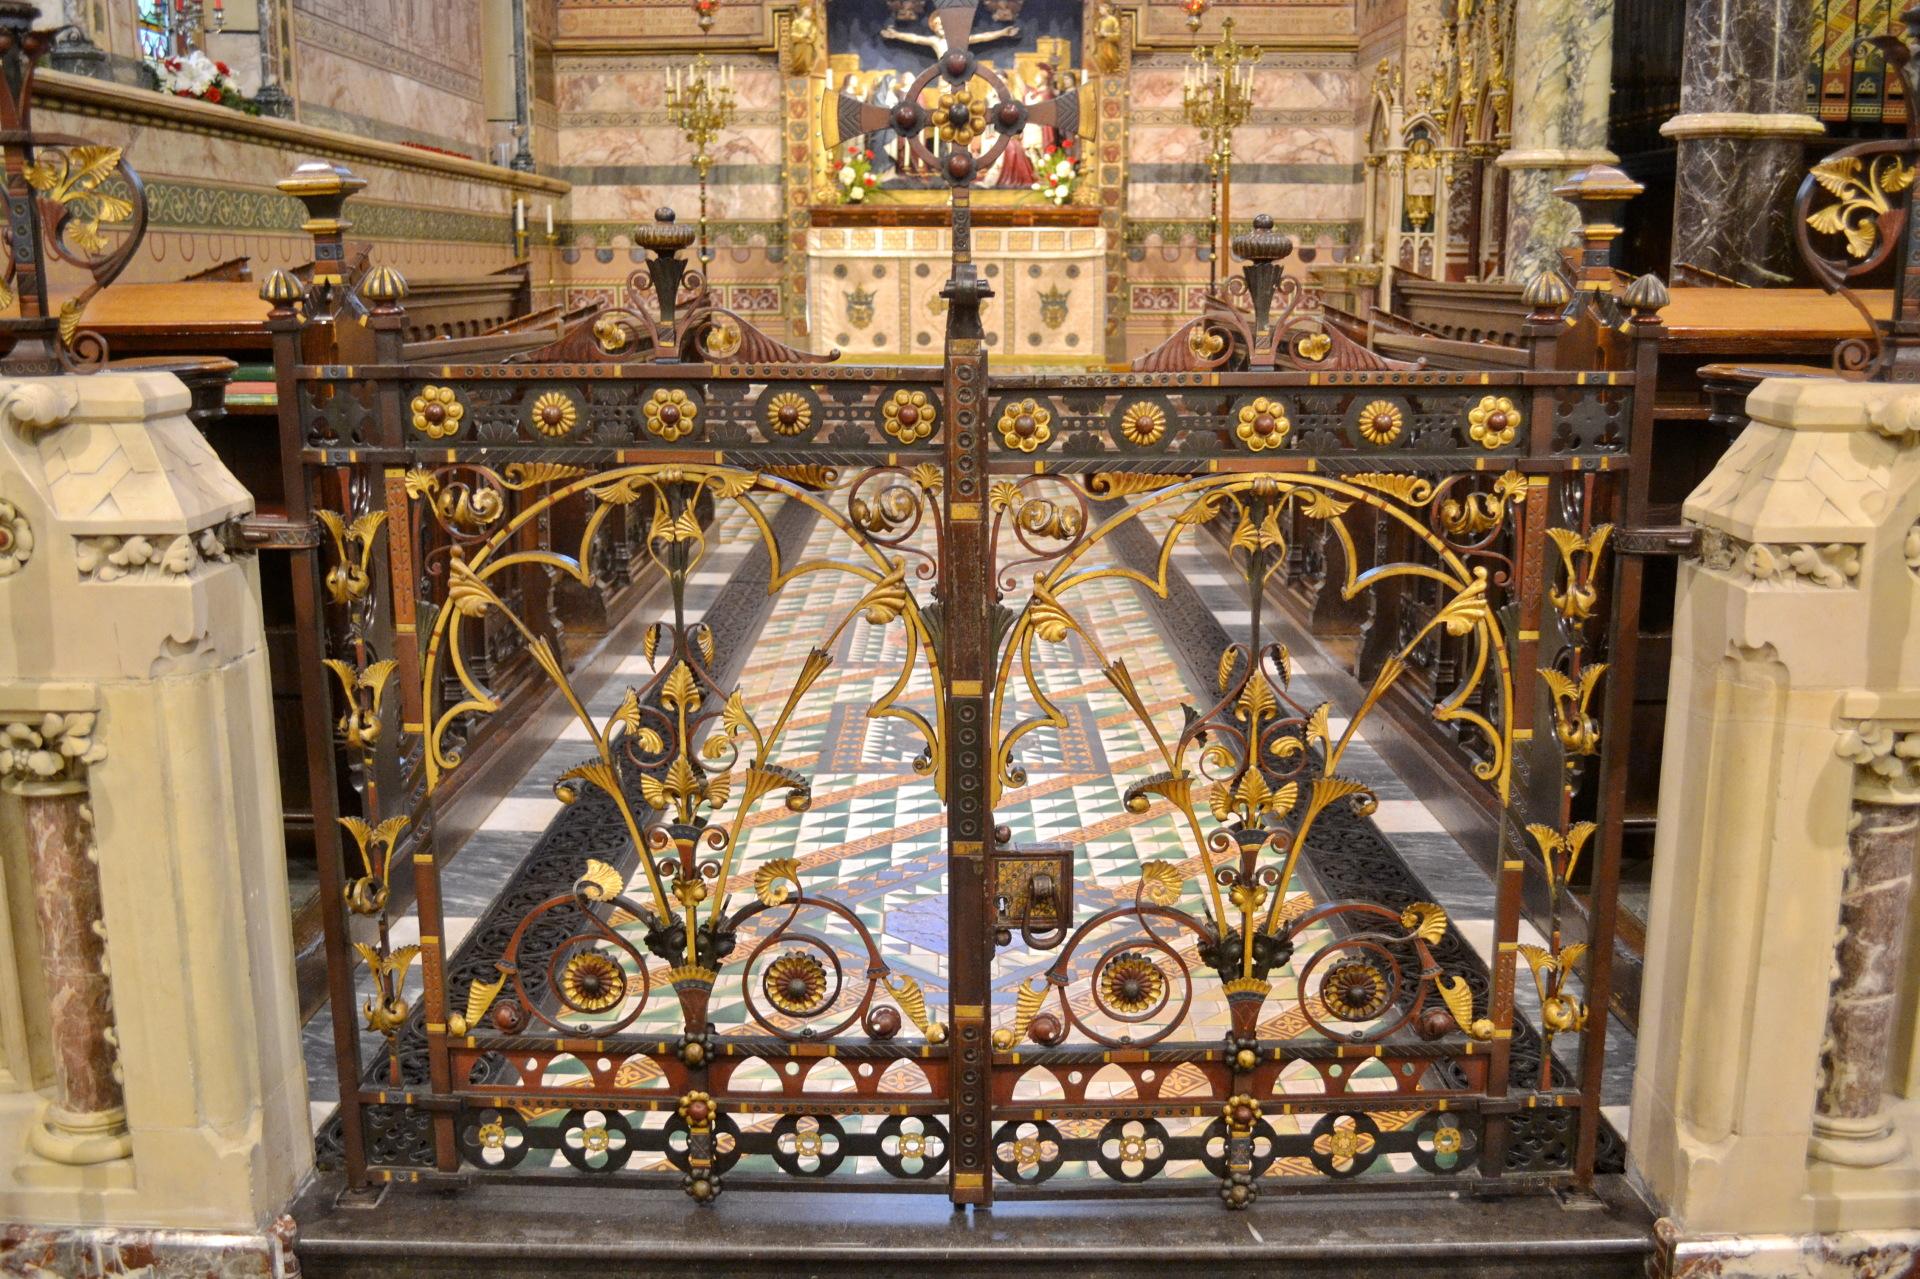 The Chancel Gates